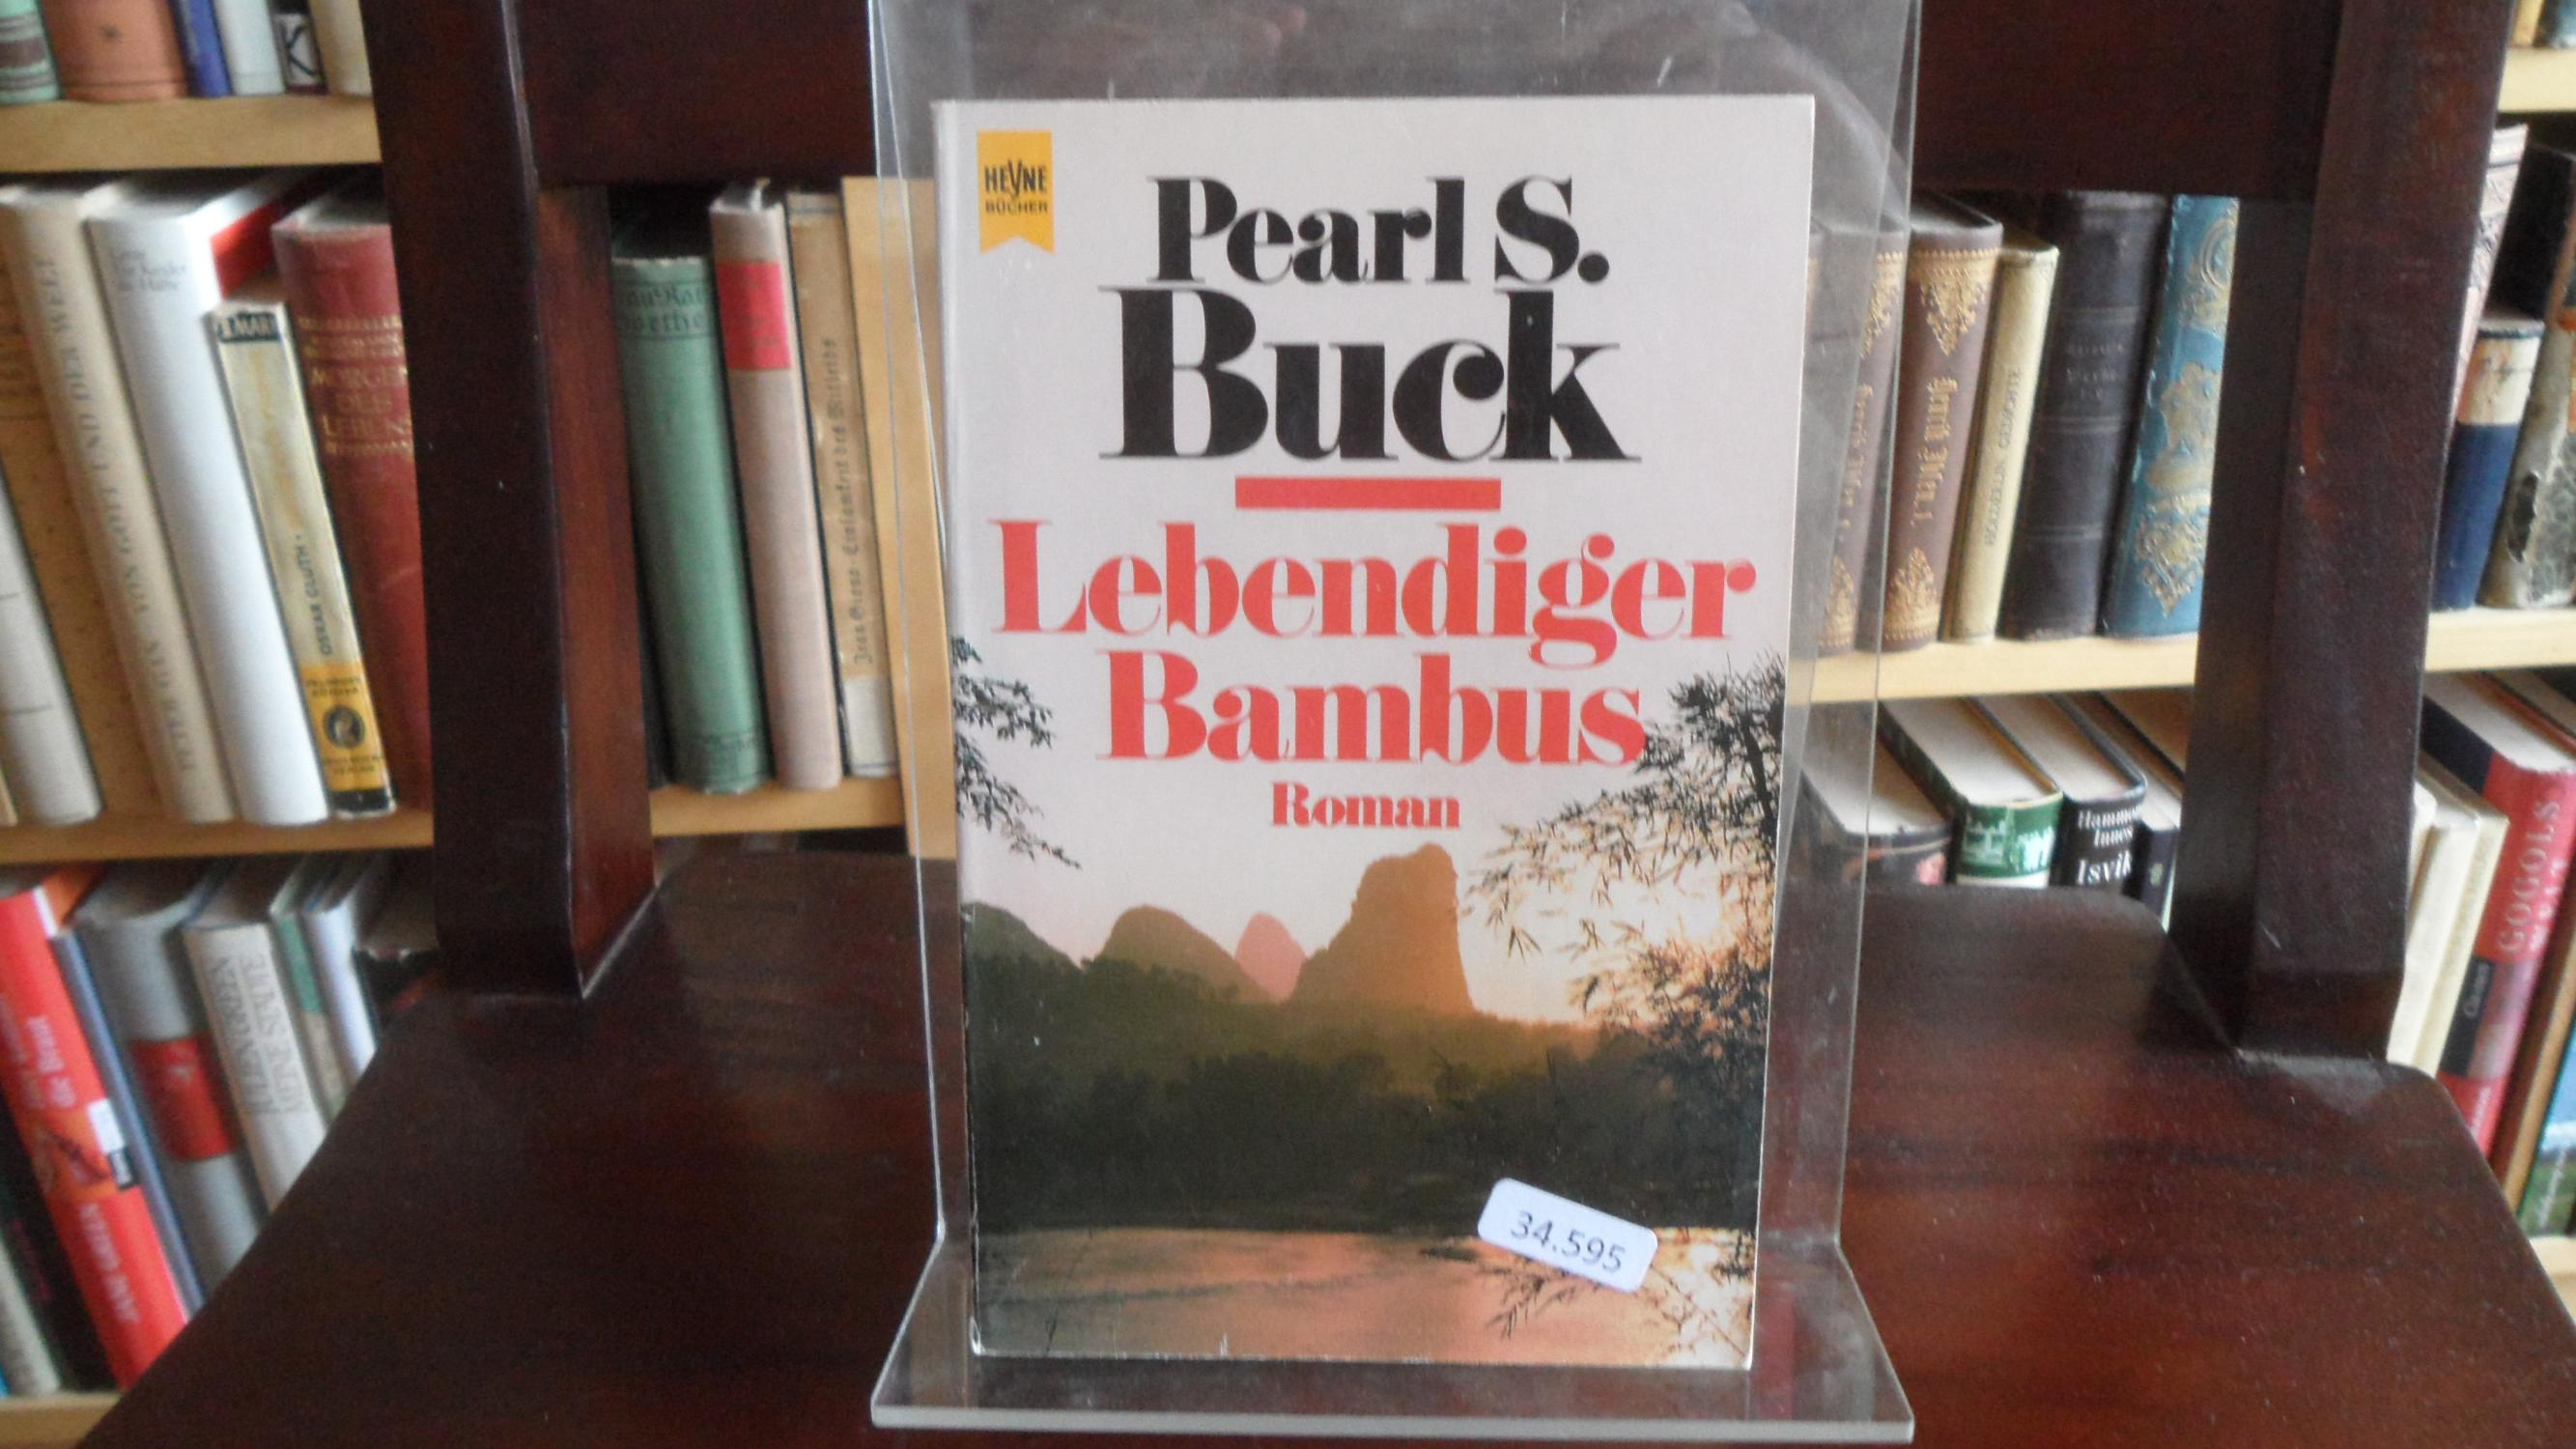 Lebendiger Bambus. Roman.: Buck, Pearl S.: